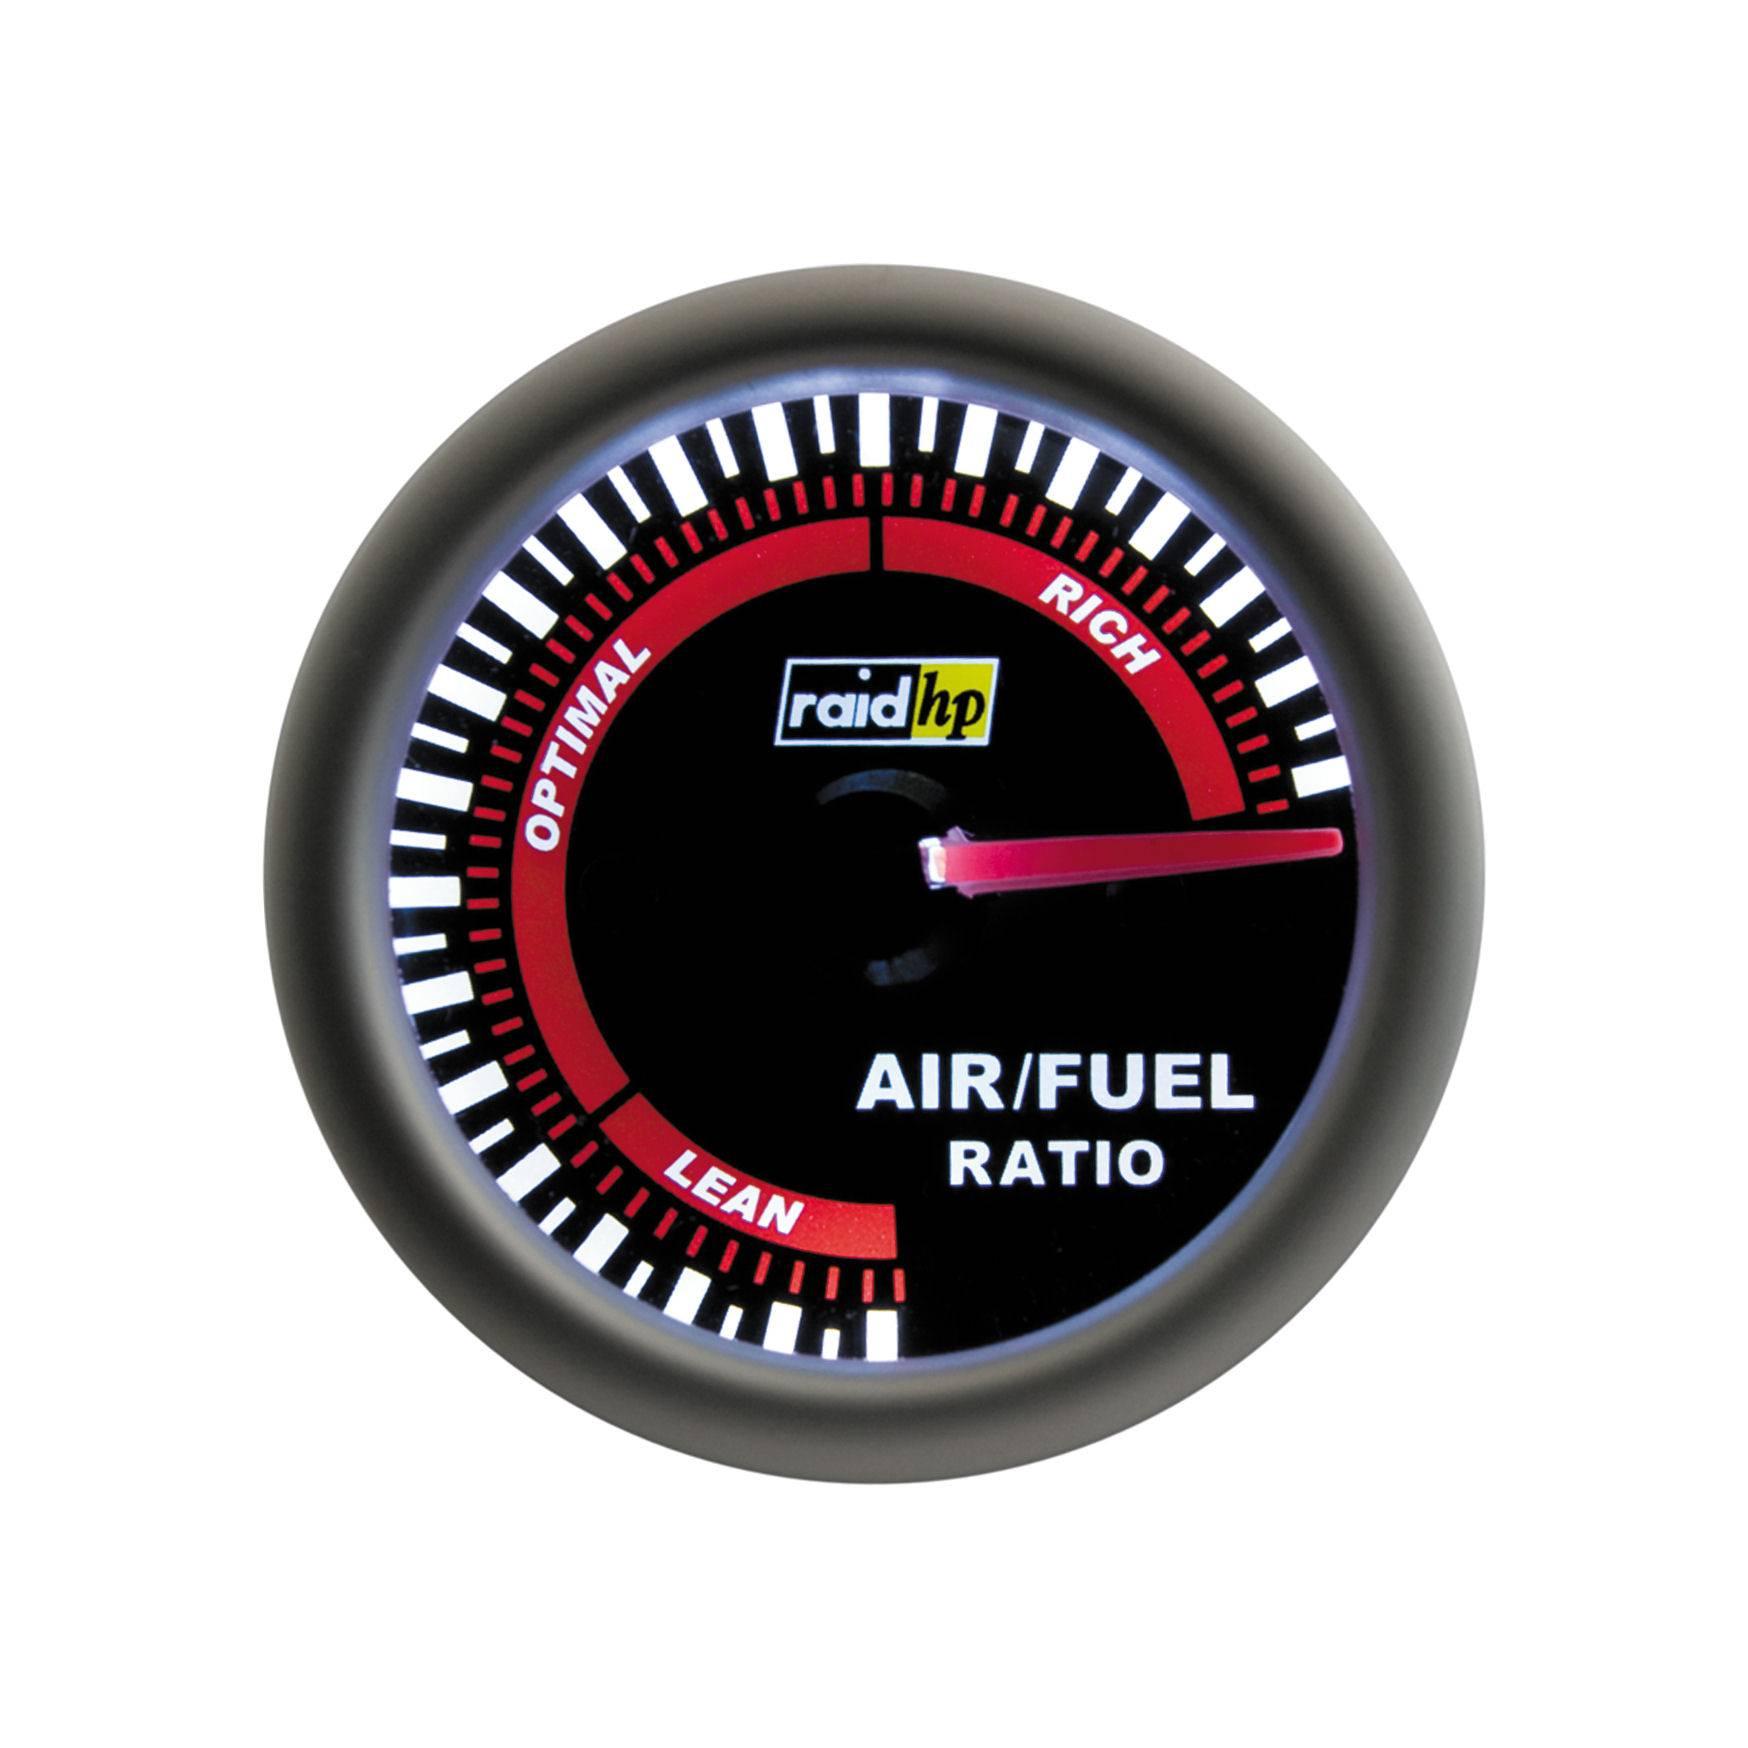 Palubný ukazovateľ pomeru vzduch/palivo Raid Hp NightFlight, 660410